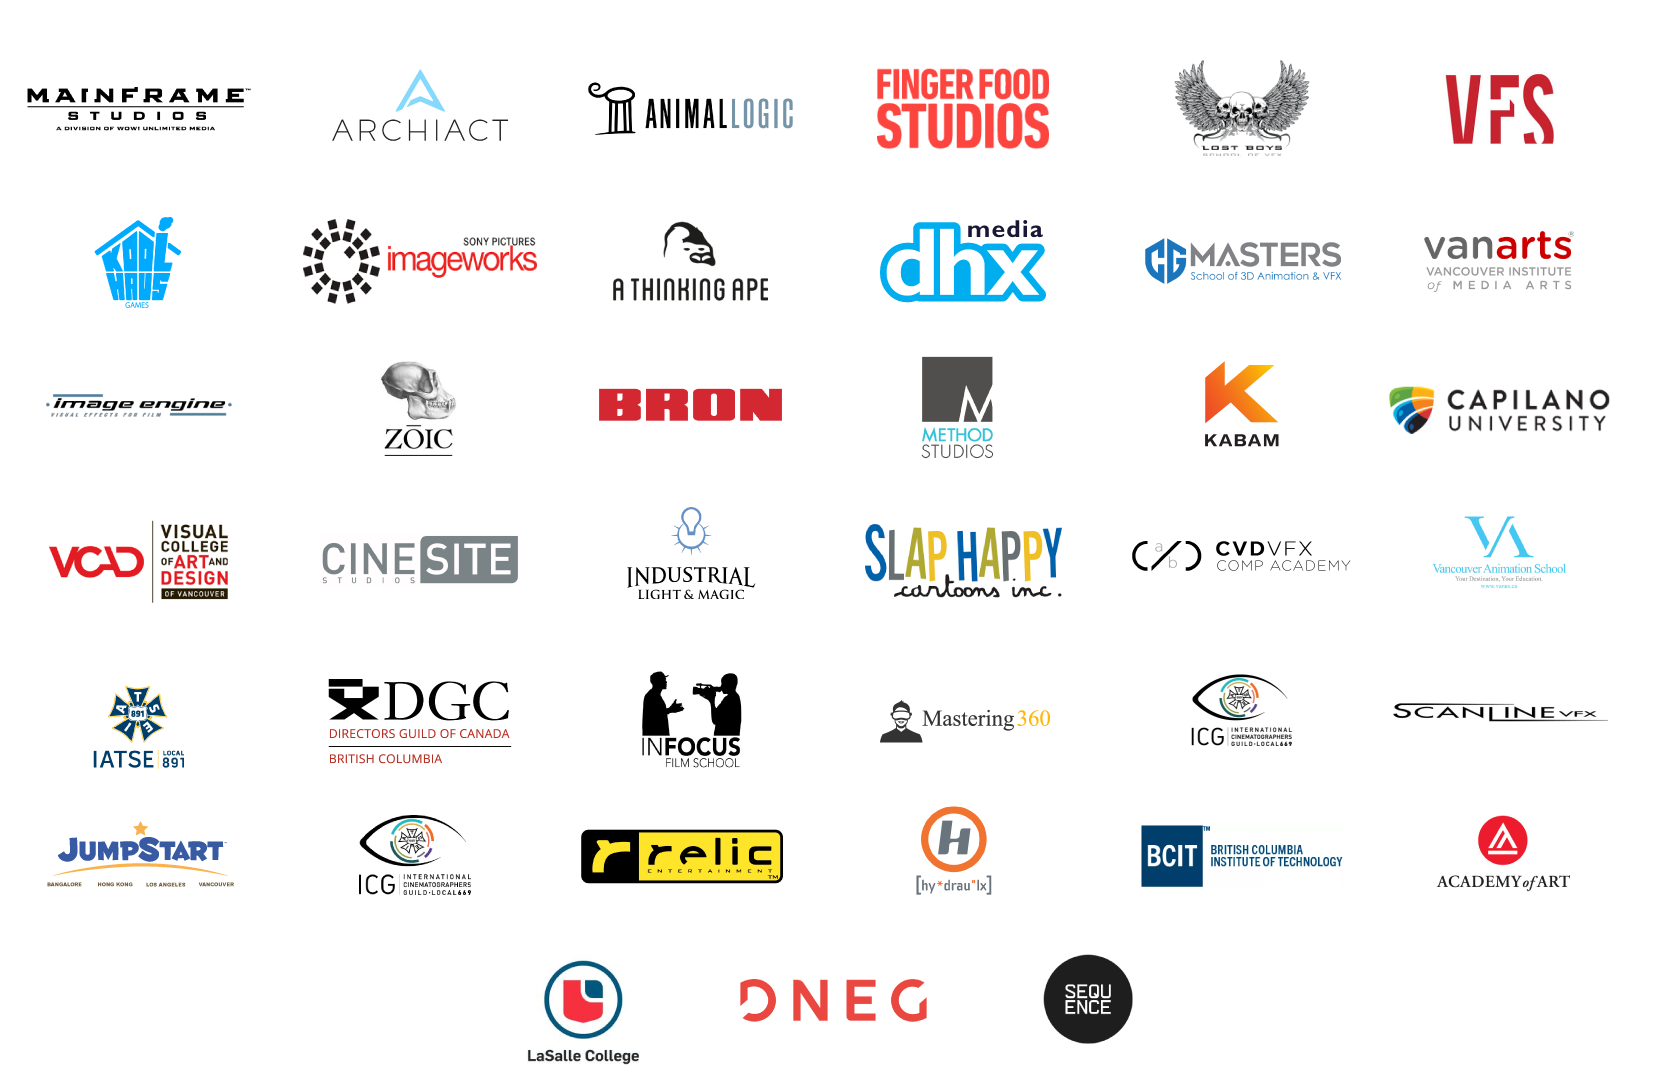 Vancouver Digital Entertainment Career Fair 2019 Exhibitors